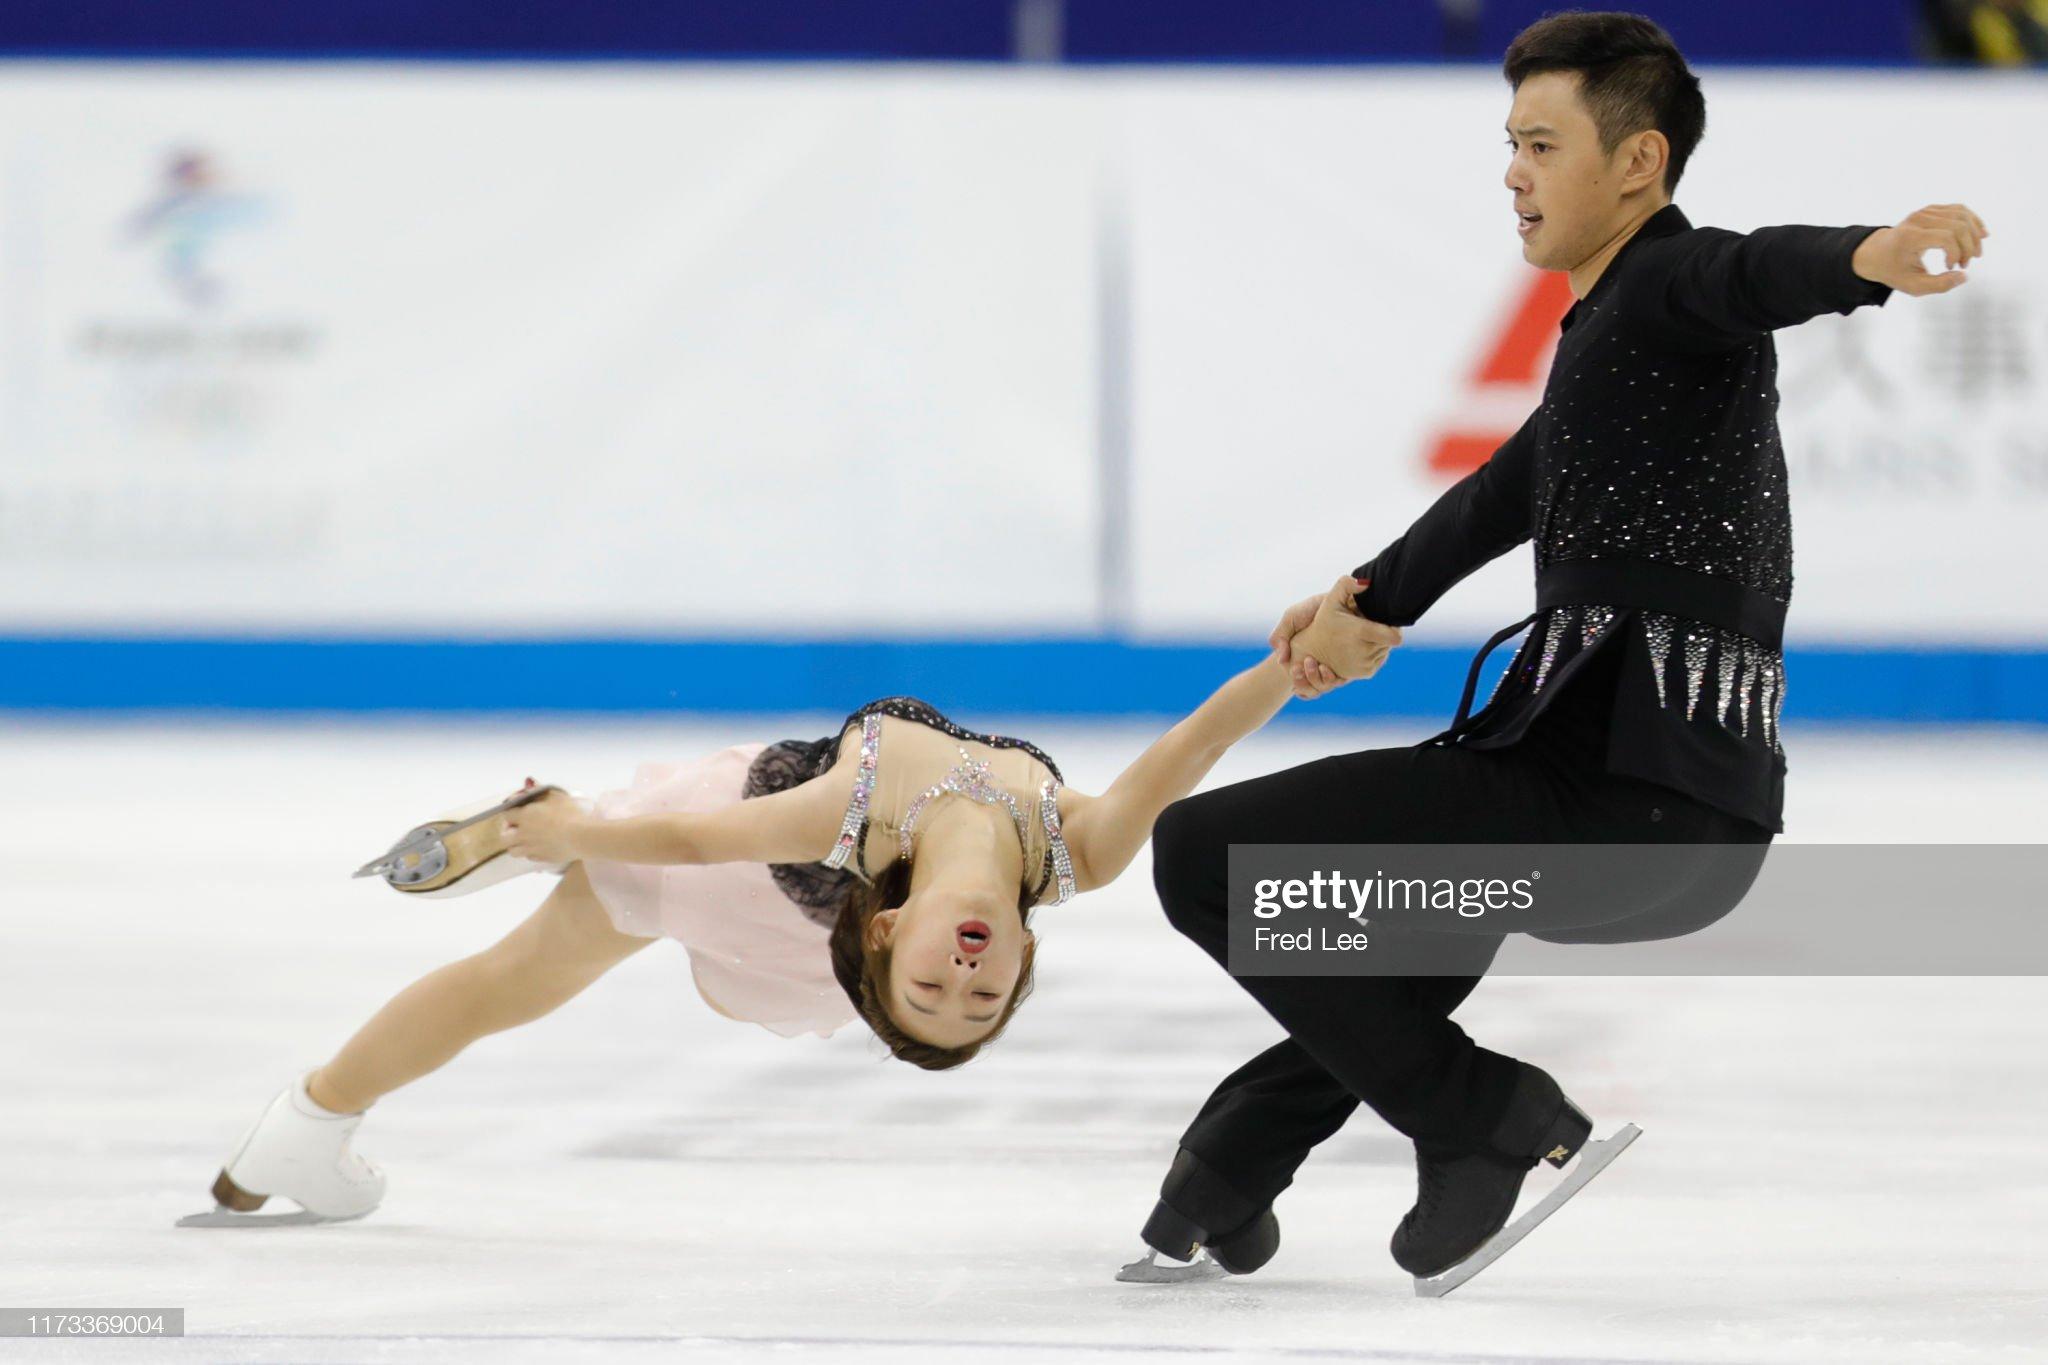 Shanghai Trophy (Invitational). 3-5 октября 2019. Шанхай (Китай) - Страница 3 Wanqi-ning-and-chao-wang-of-china-perform-in-the-pairs-short-program-picture-id1173369004?s=2048x2048